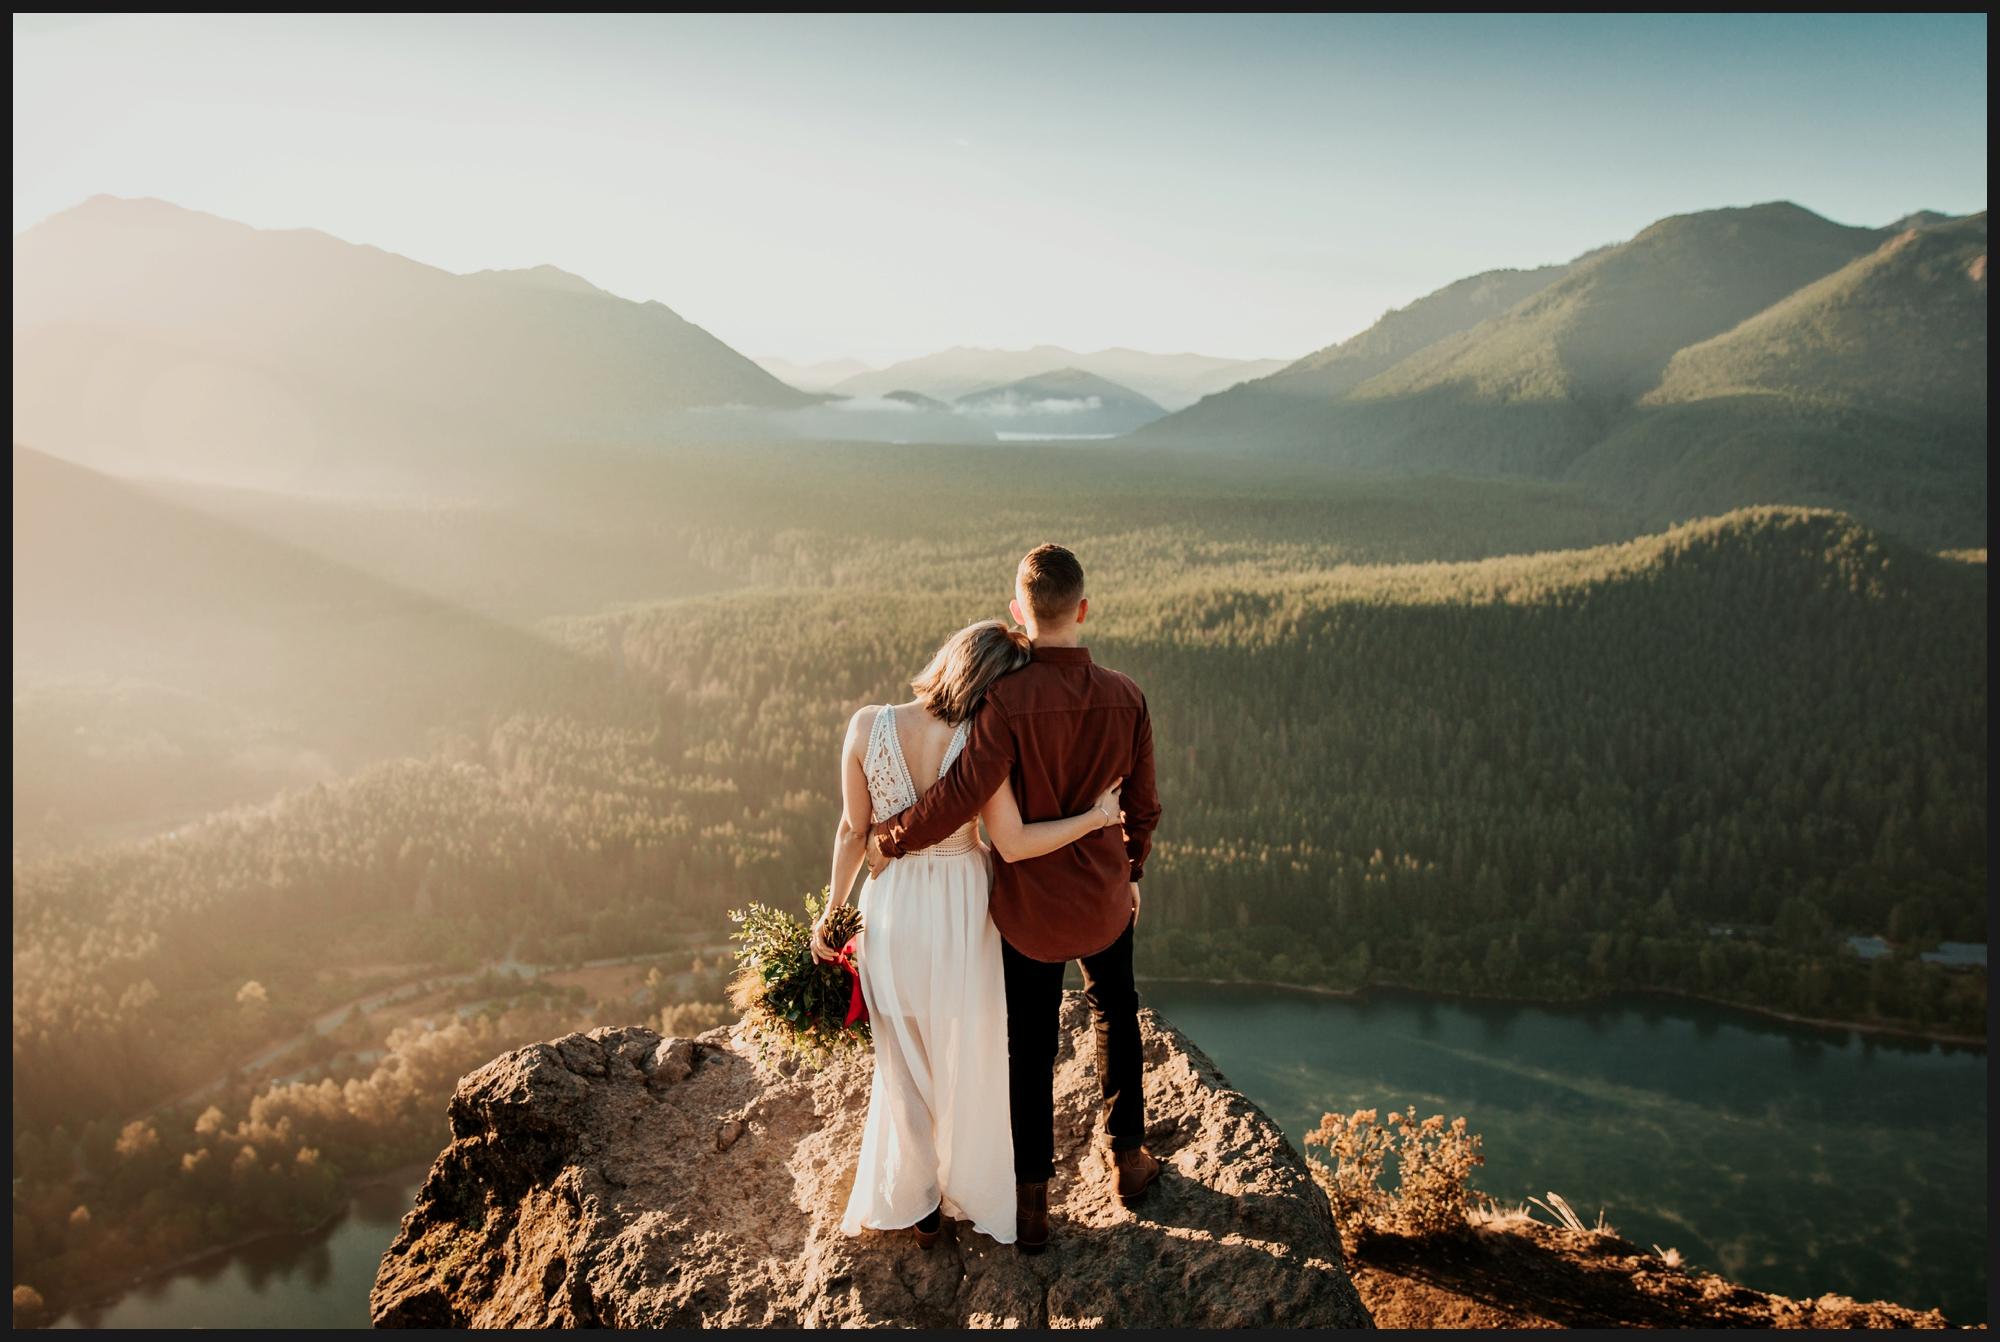 Orlando-Wedding-Photographer-destination-wedding-photographer-florida-wedding-photographer-bohemian-wedding-photographer_0438.jpg